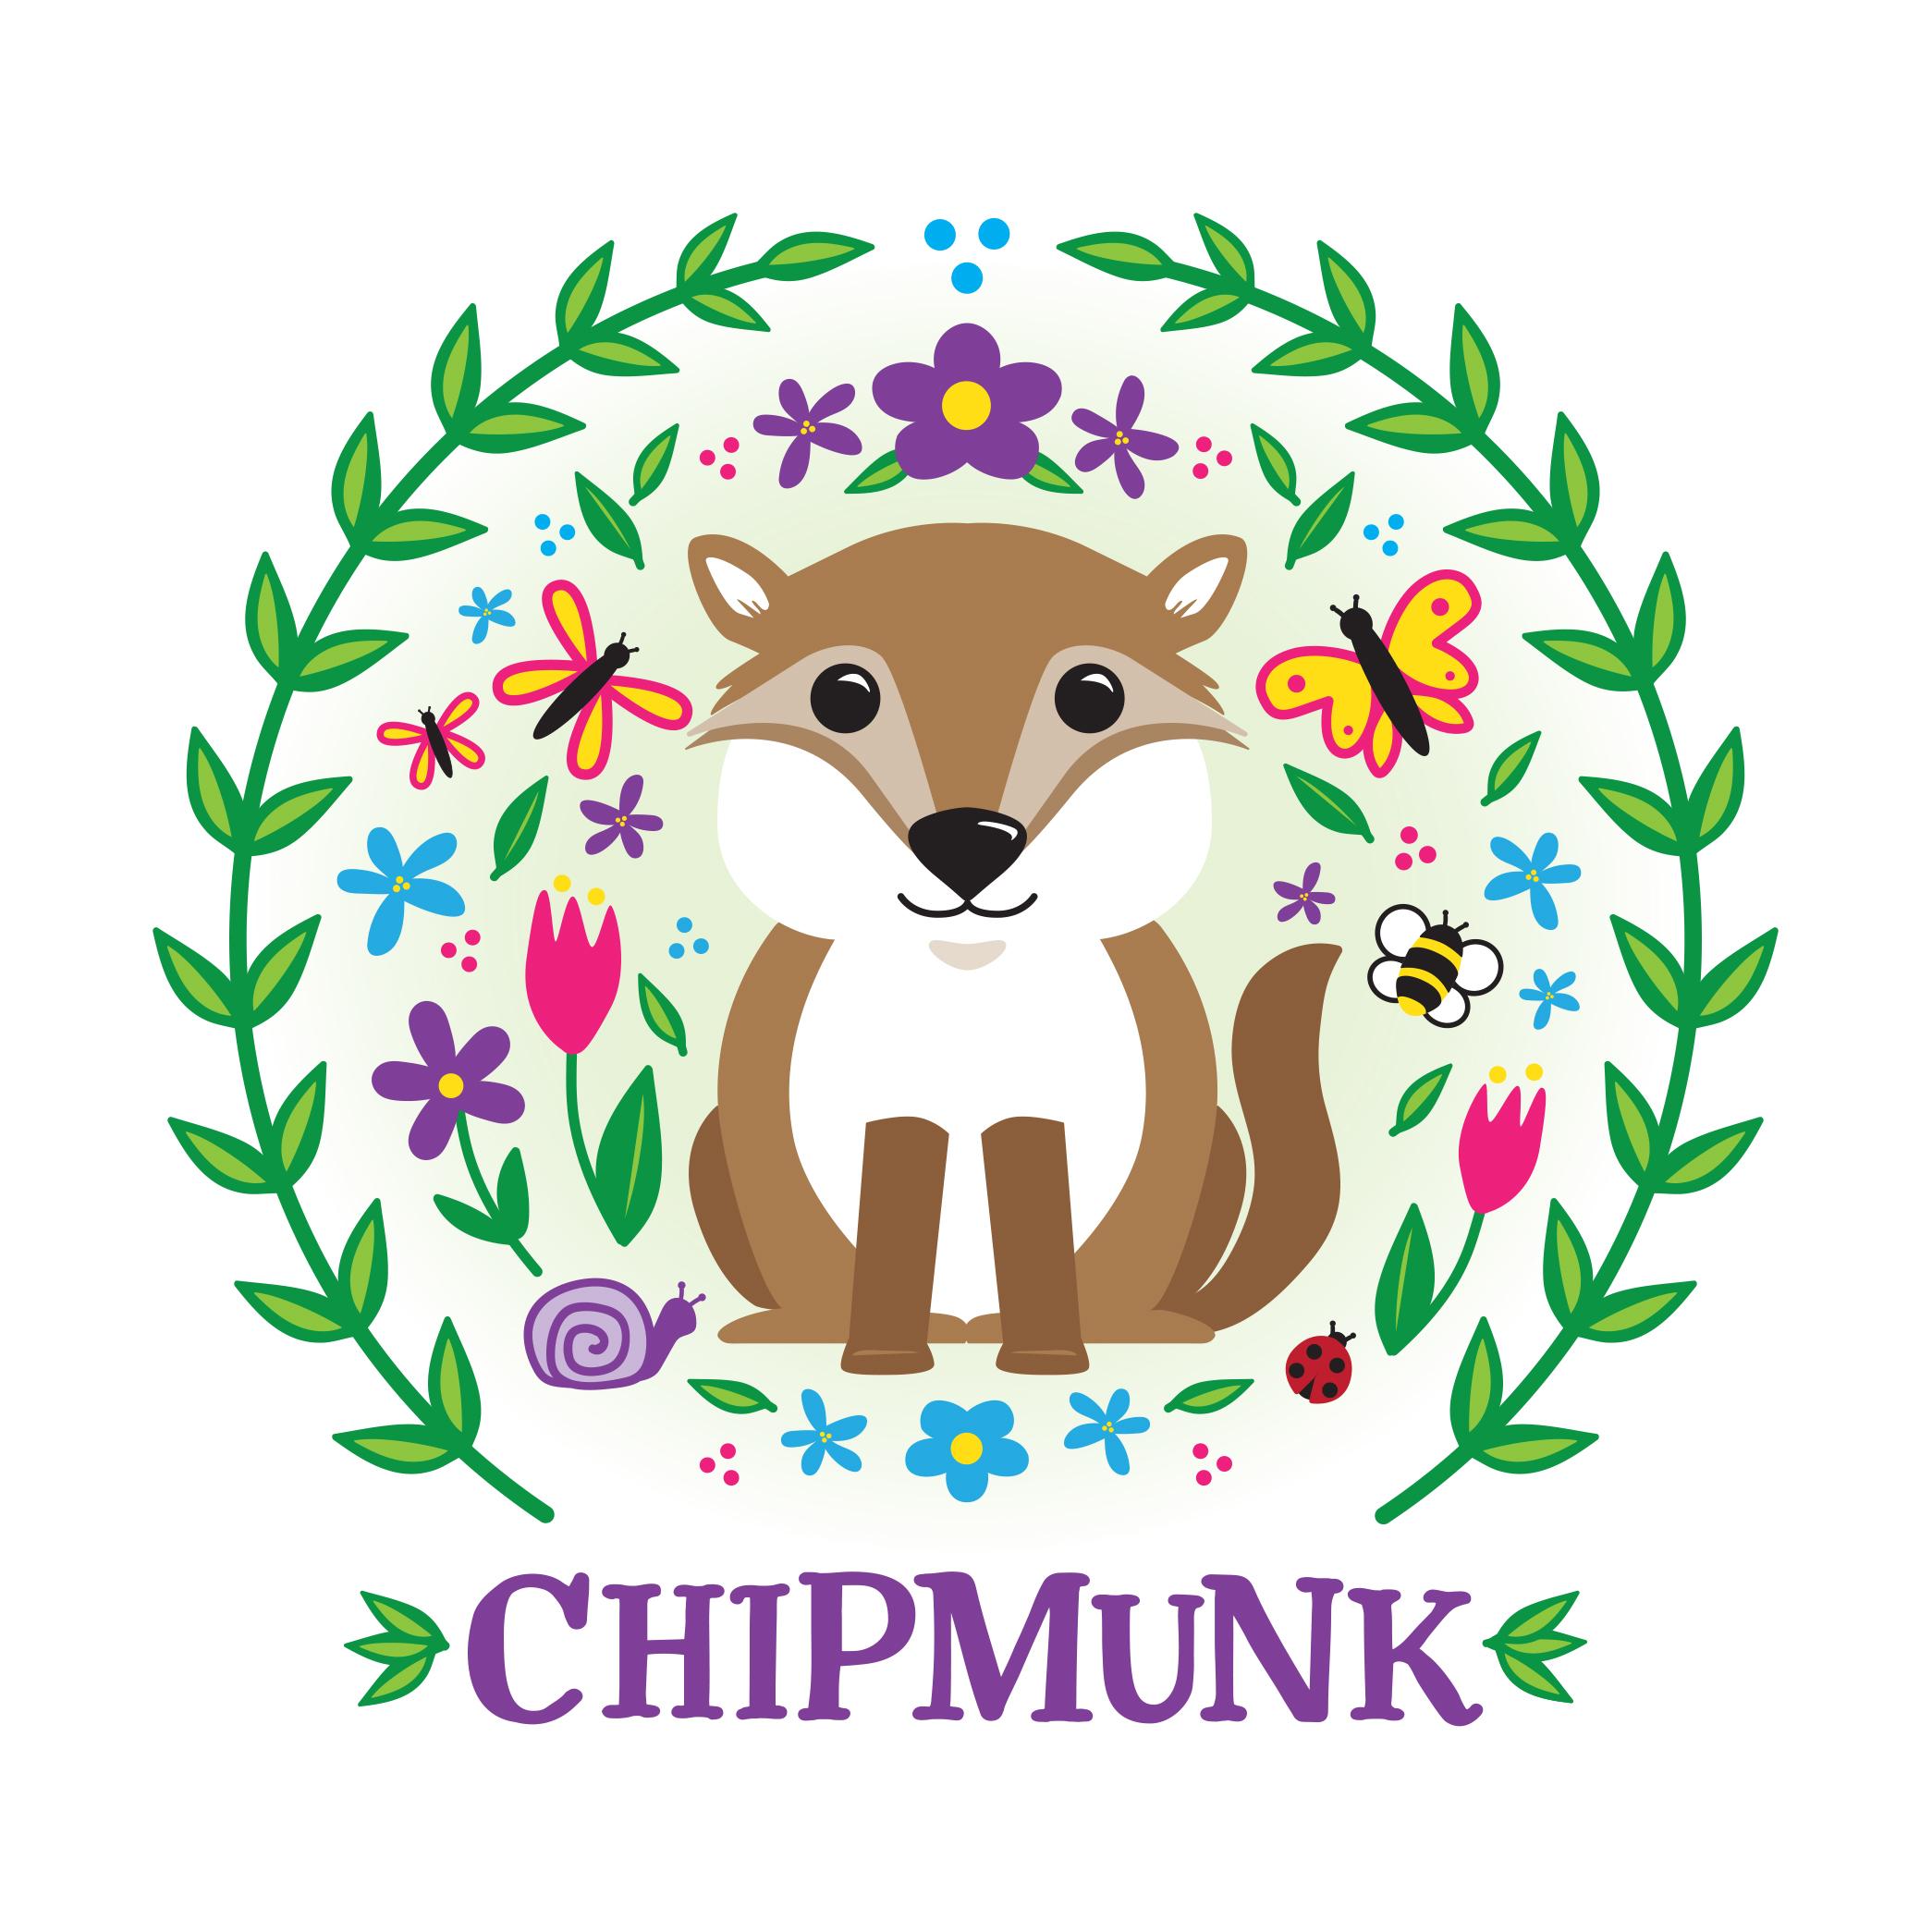 chipmunk_.jpg